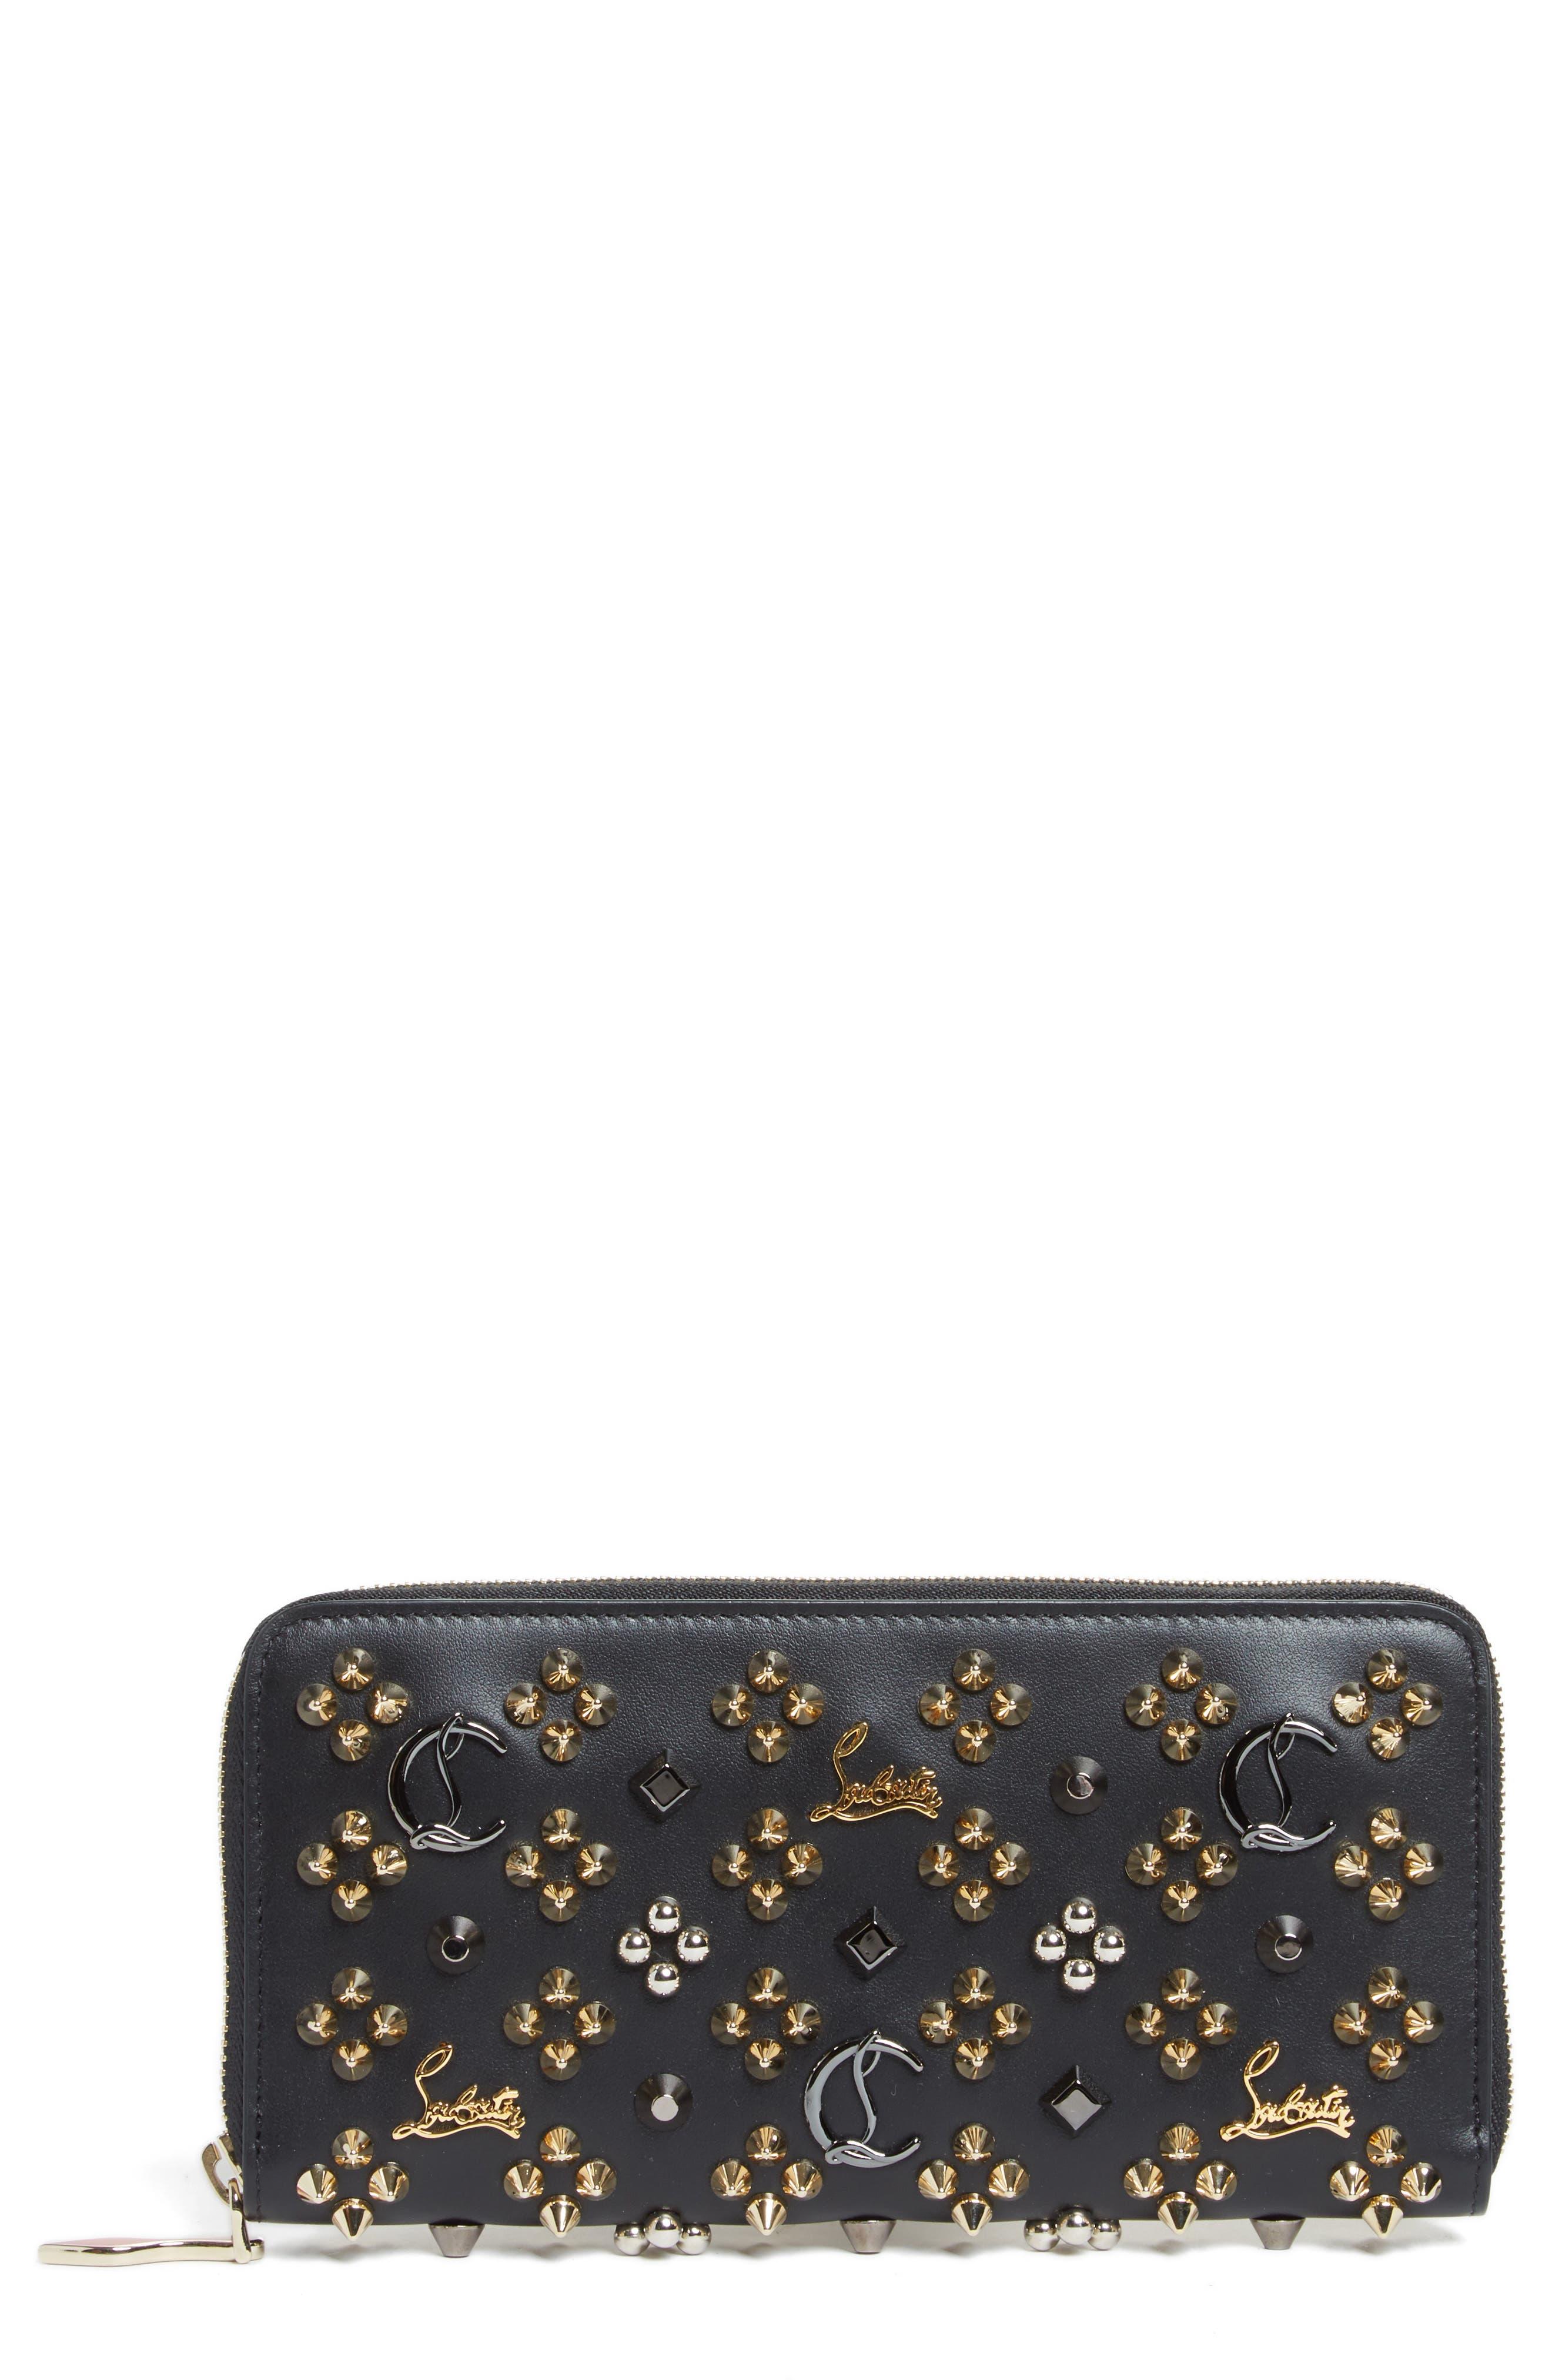 Panettone Spiked Calfskin Wallet,                             Main thumbnail 1, color,                             BLACK/MULTIMETAL